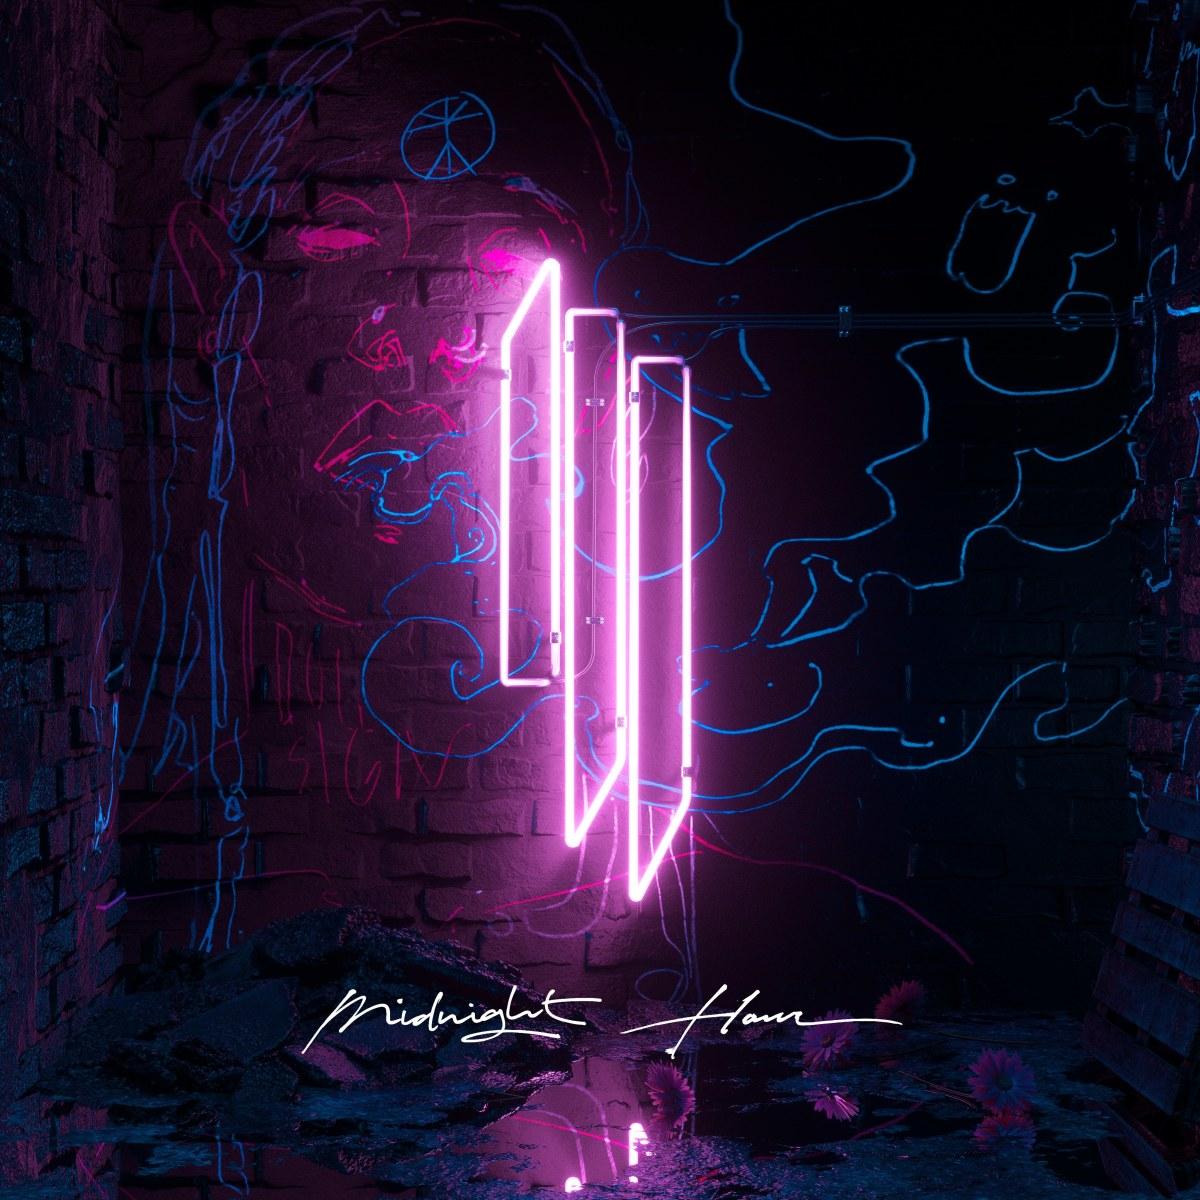 Skrillex & Boys Noize - Midnight Hour (feat. Ty Dolla $ign) - ALBUM ARTWORK